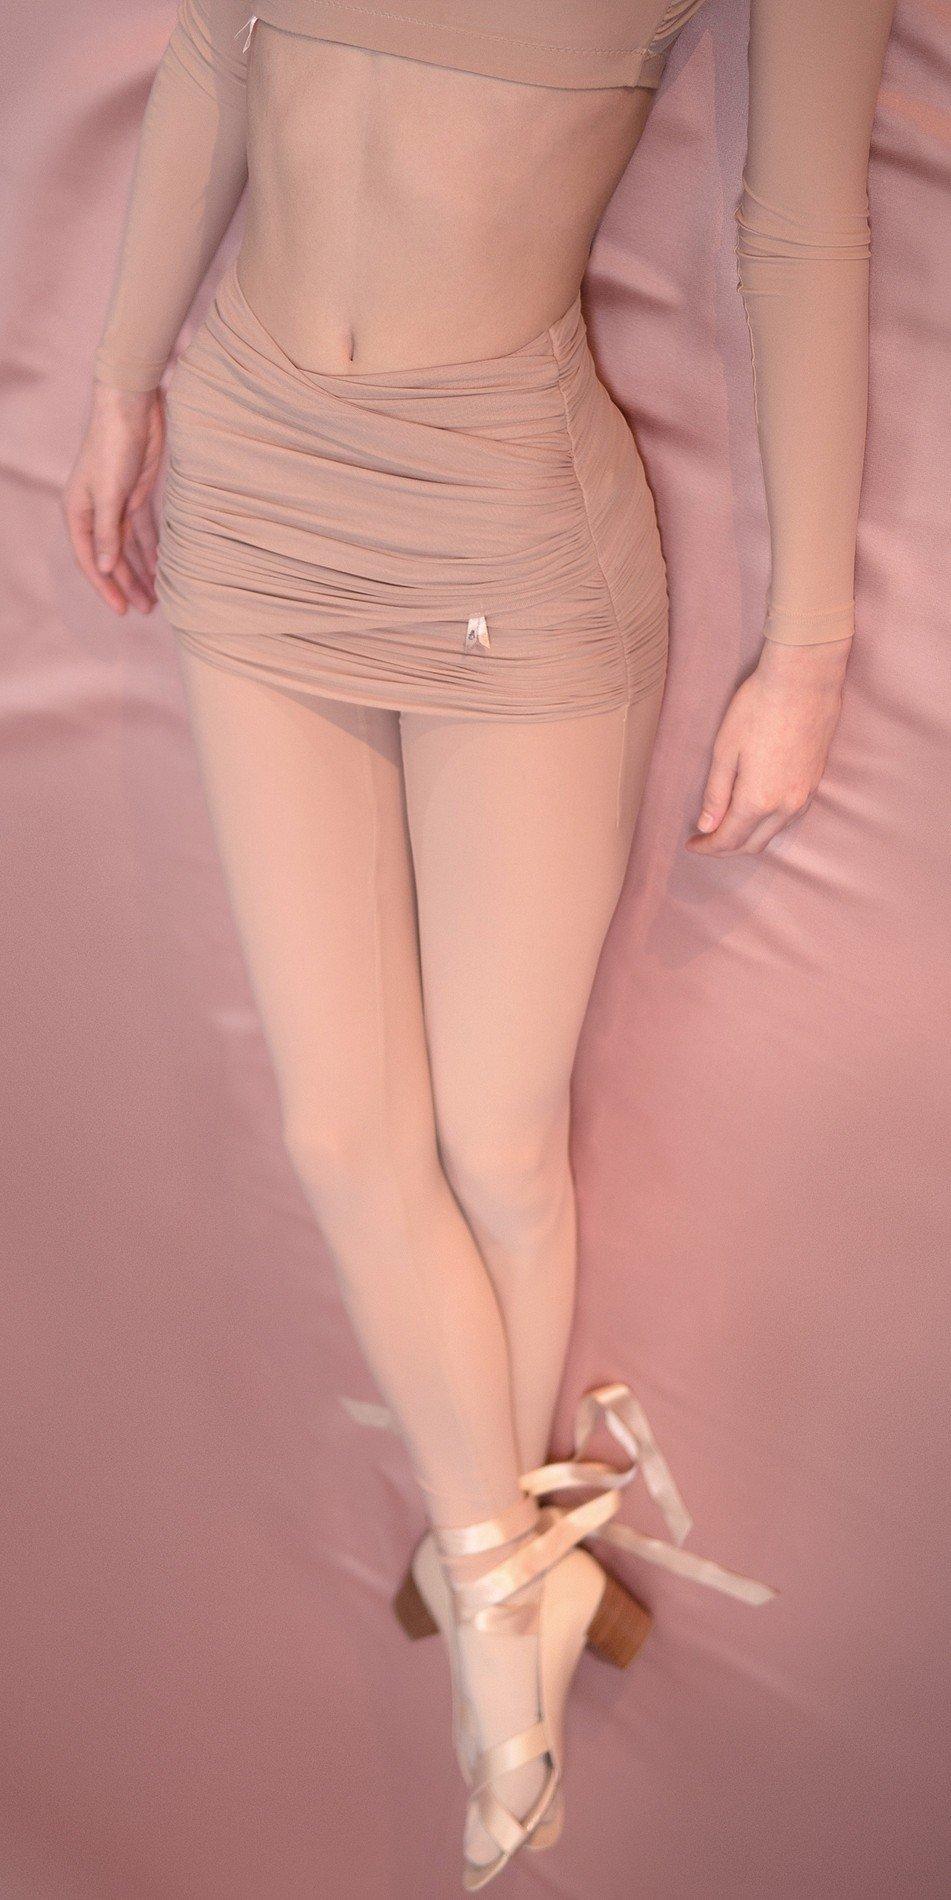 GRES leggings20with20draped20wrap20mini20skirt nude 3 r 1